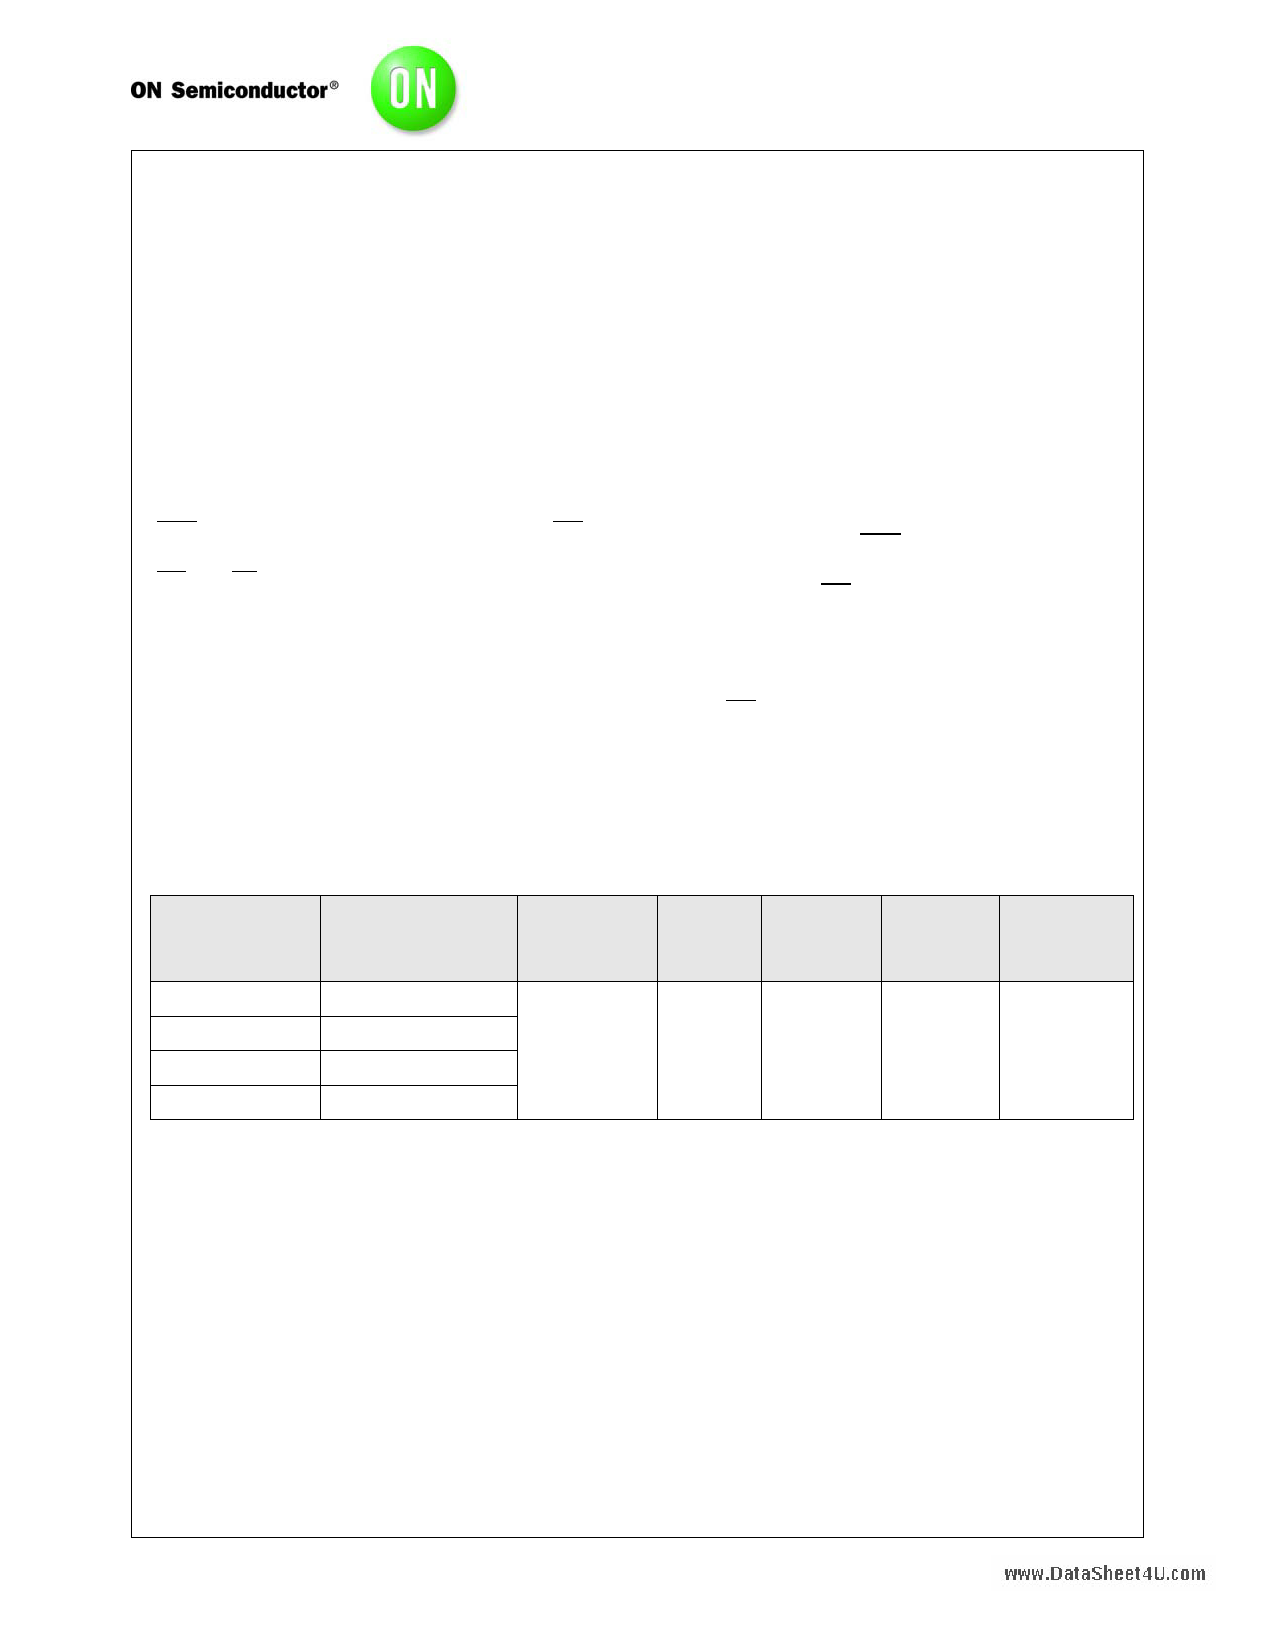 N02L63W2A datasheet